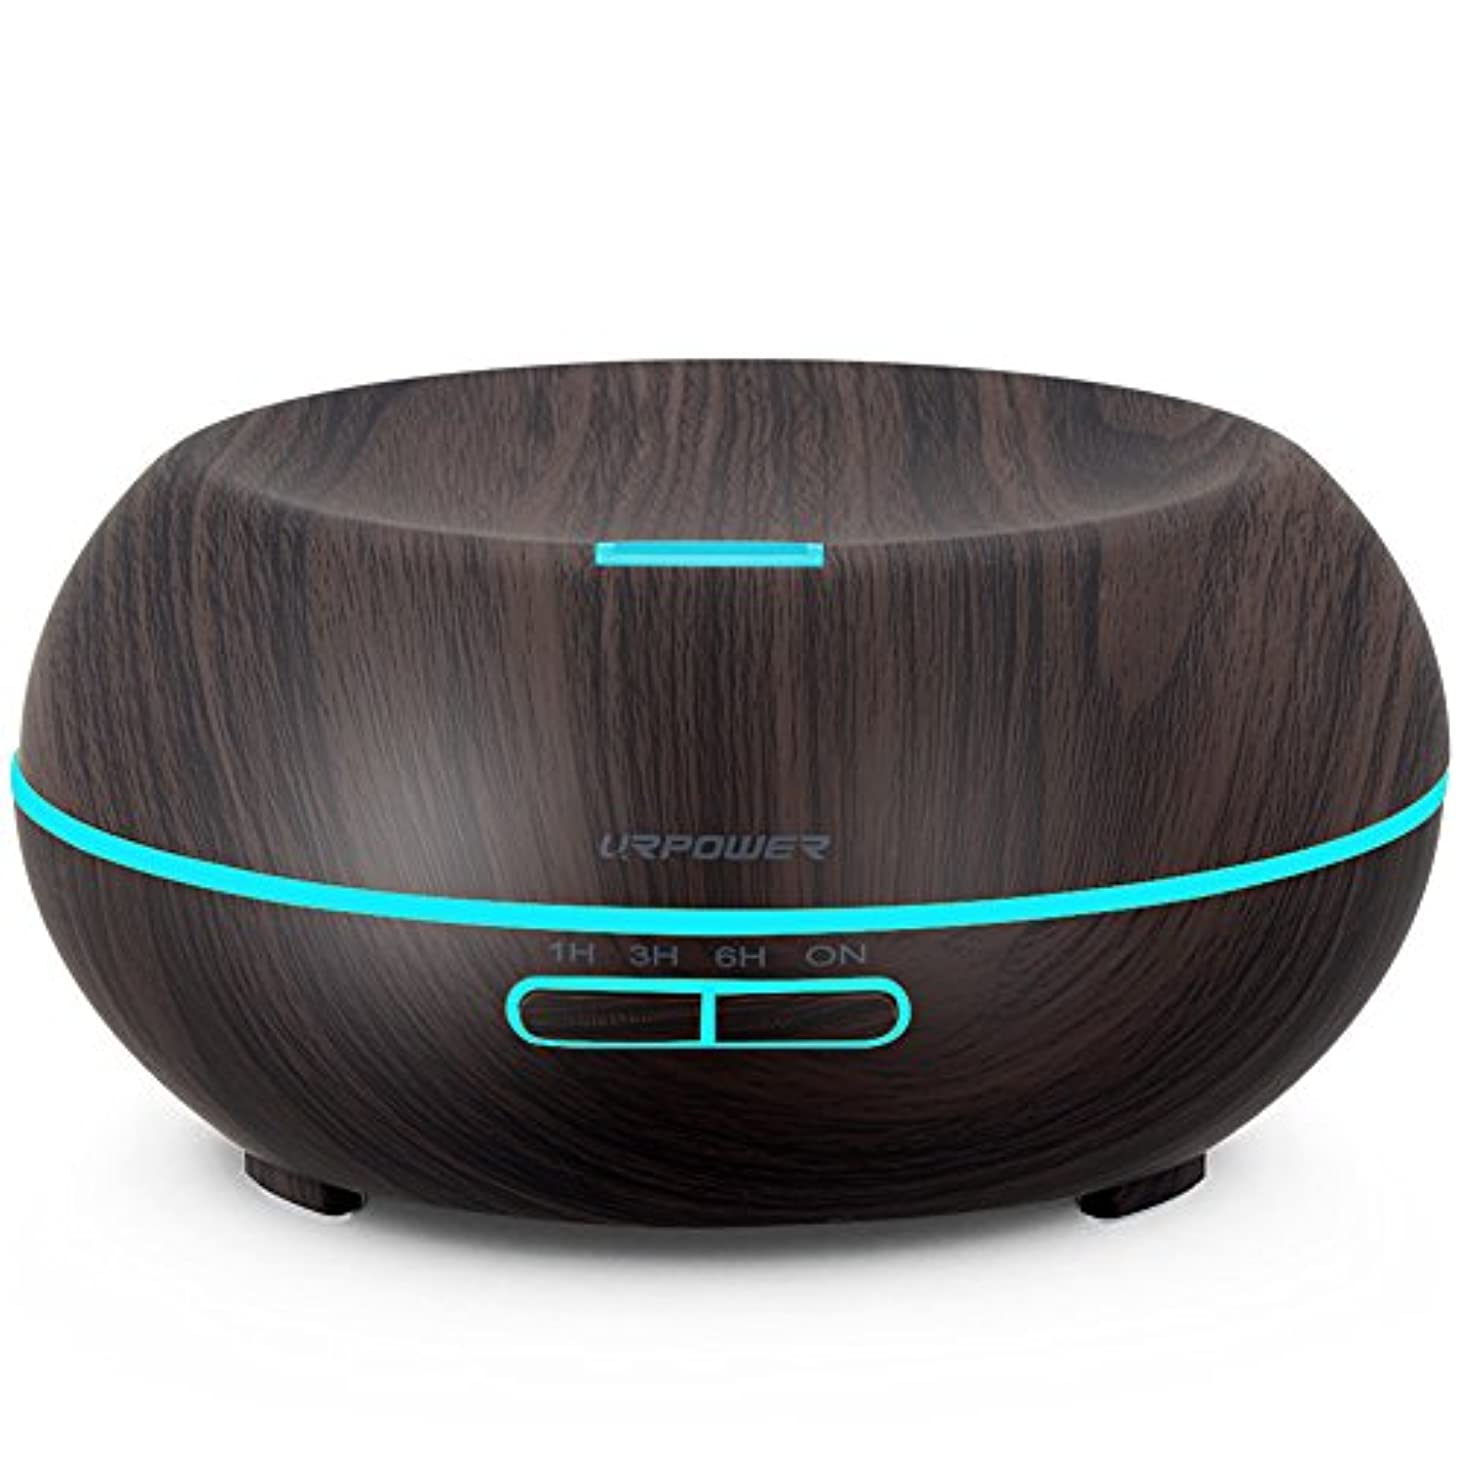 URPOWER Essential Oil Diffuser、200 ml木目アロマテラピーディフューザー超音波クールモードで調節可能なミストアロマ加湿器、Waterless自動遮断、7色LEDライト& 4タイマー設定